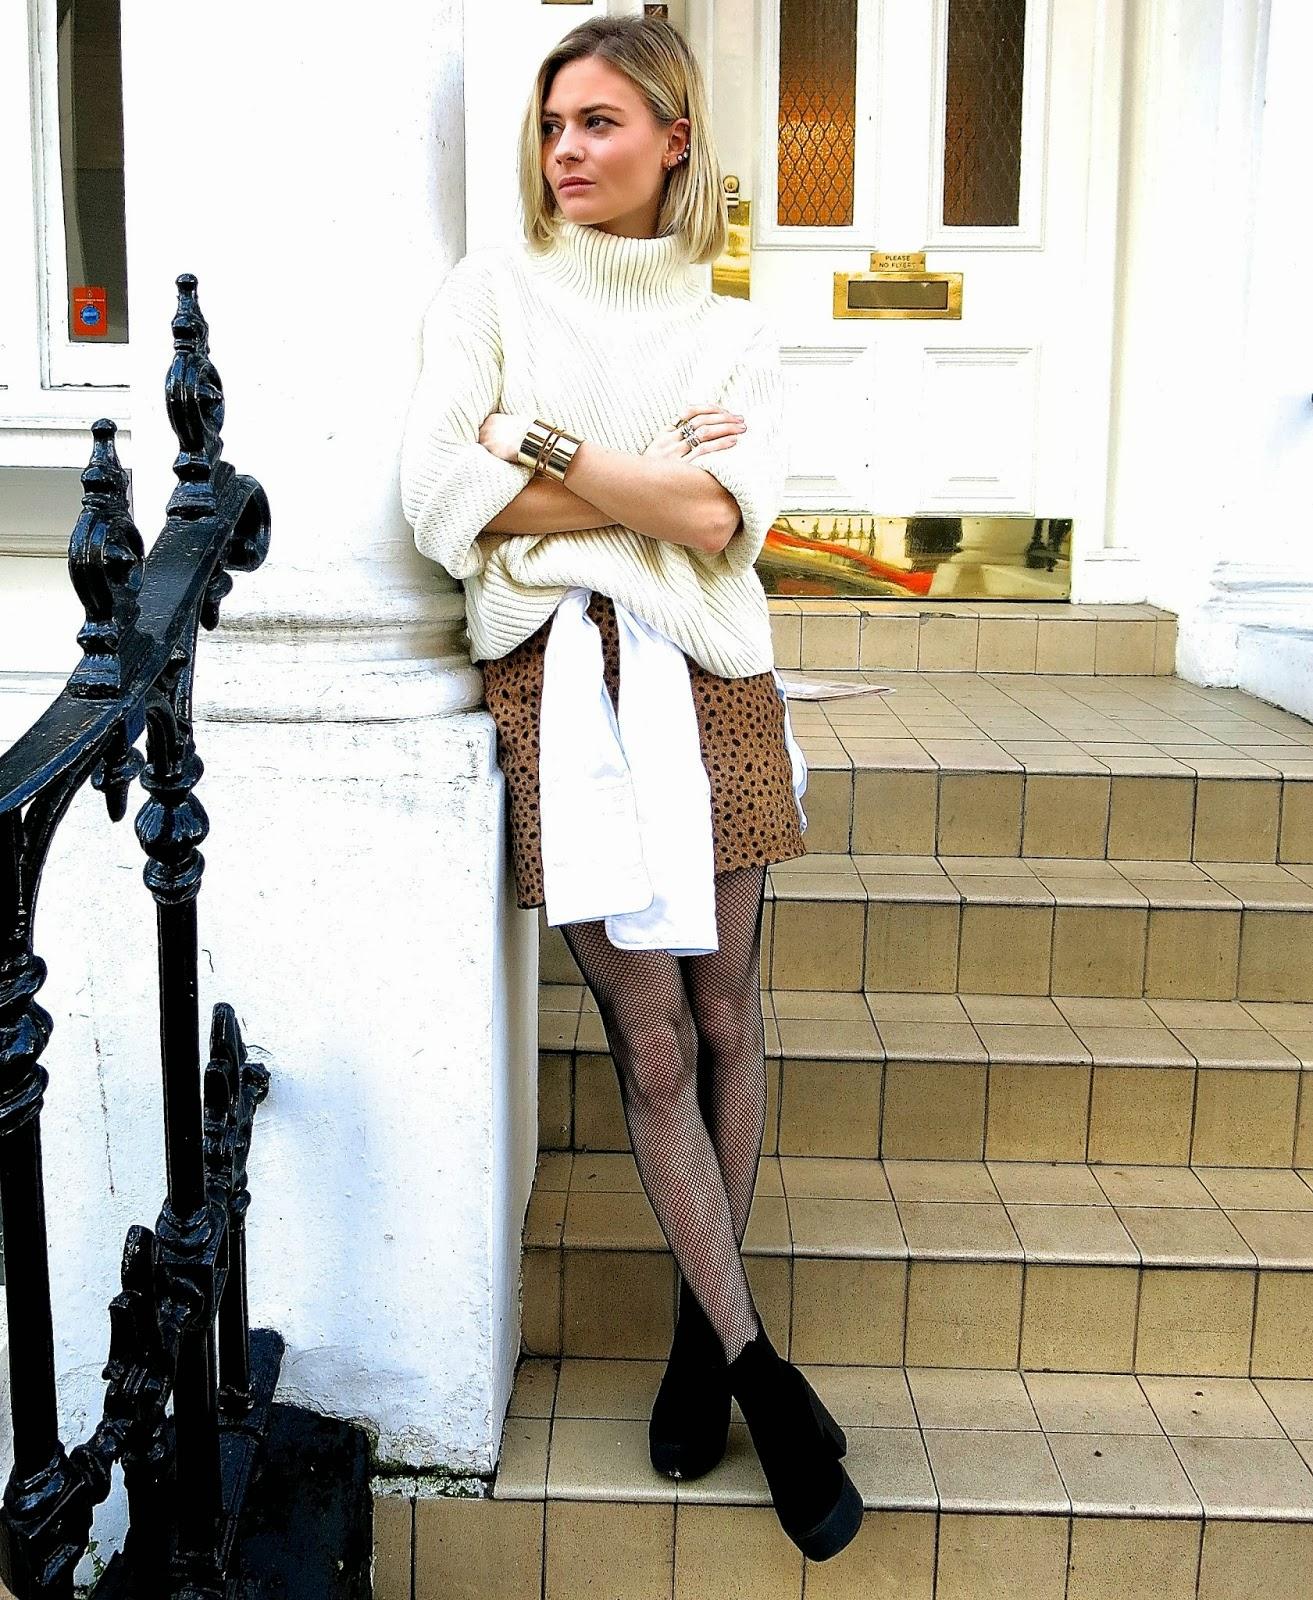 fdd07a8f0e93e I'm wearing a polo neck by & Other Stories, a men's white dress shirt, a  Shakuhachi ponyskin skirt, fishnet tights from Tabio, platform boots from  Topshop, ...